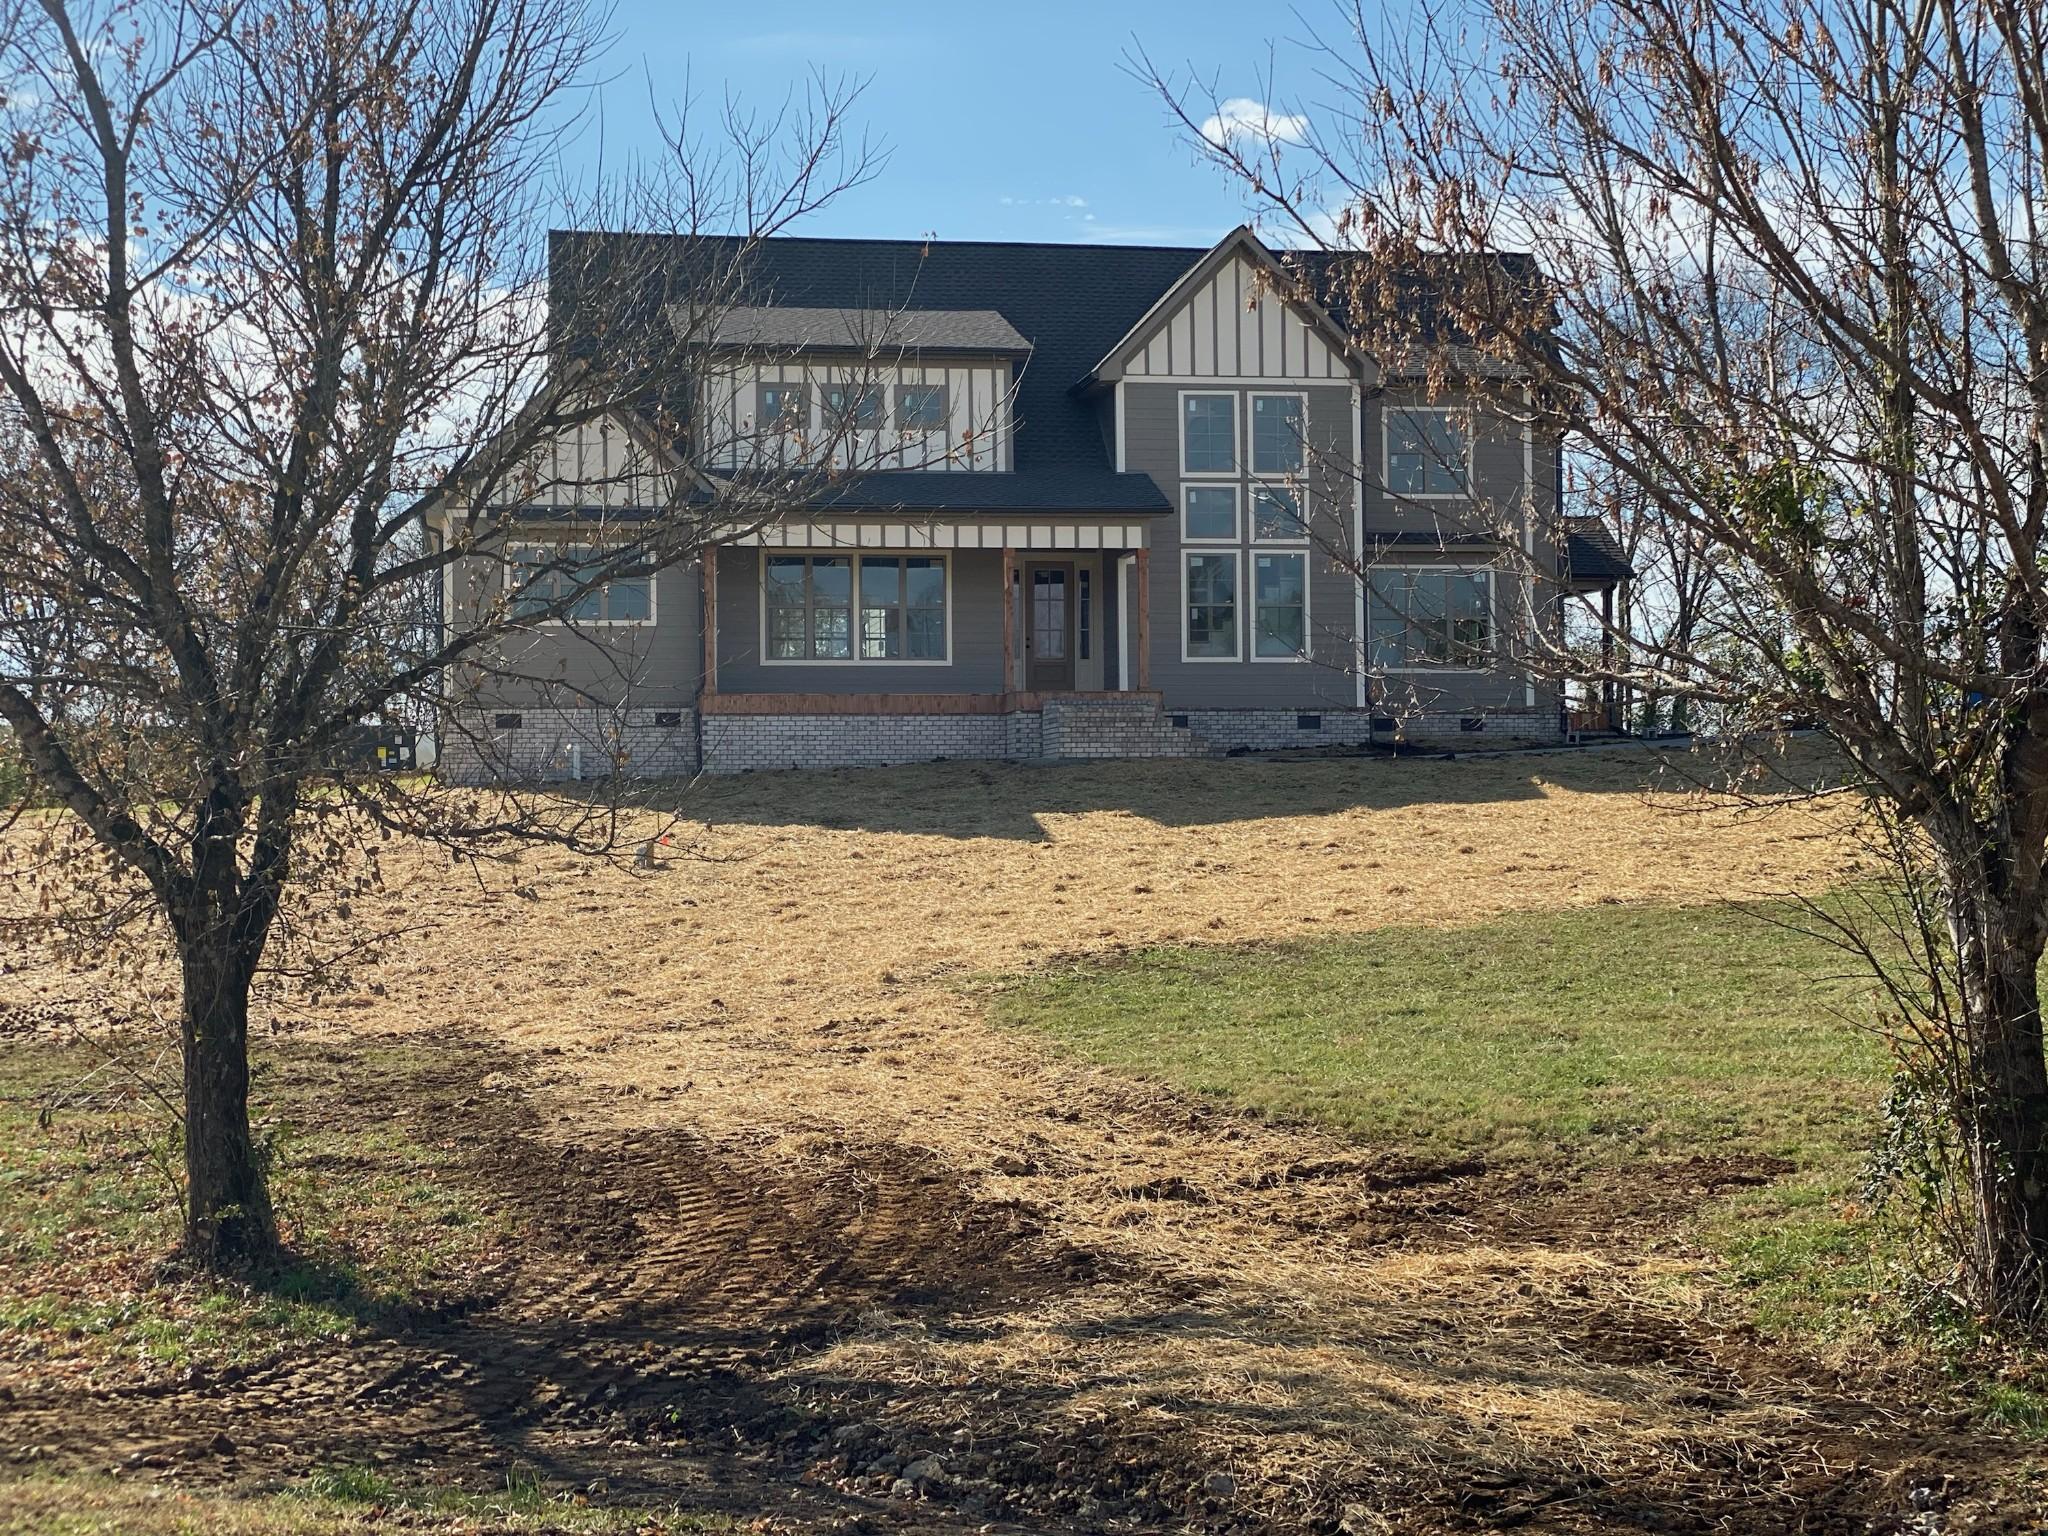 109 Tom Walker Dr, Beechgrove, TN 37018 - Beechgrove, TN real estate listing